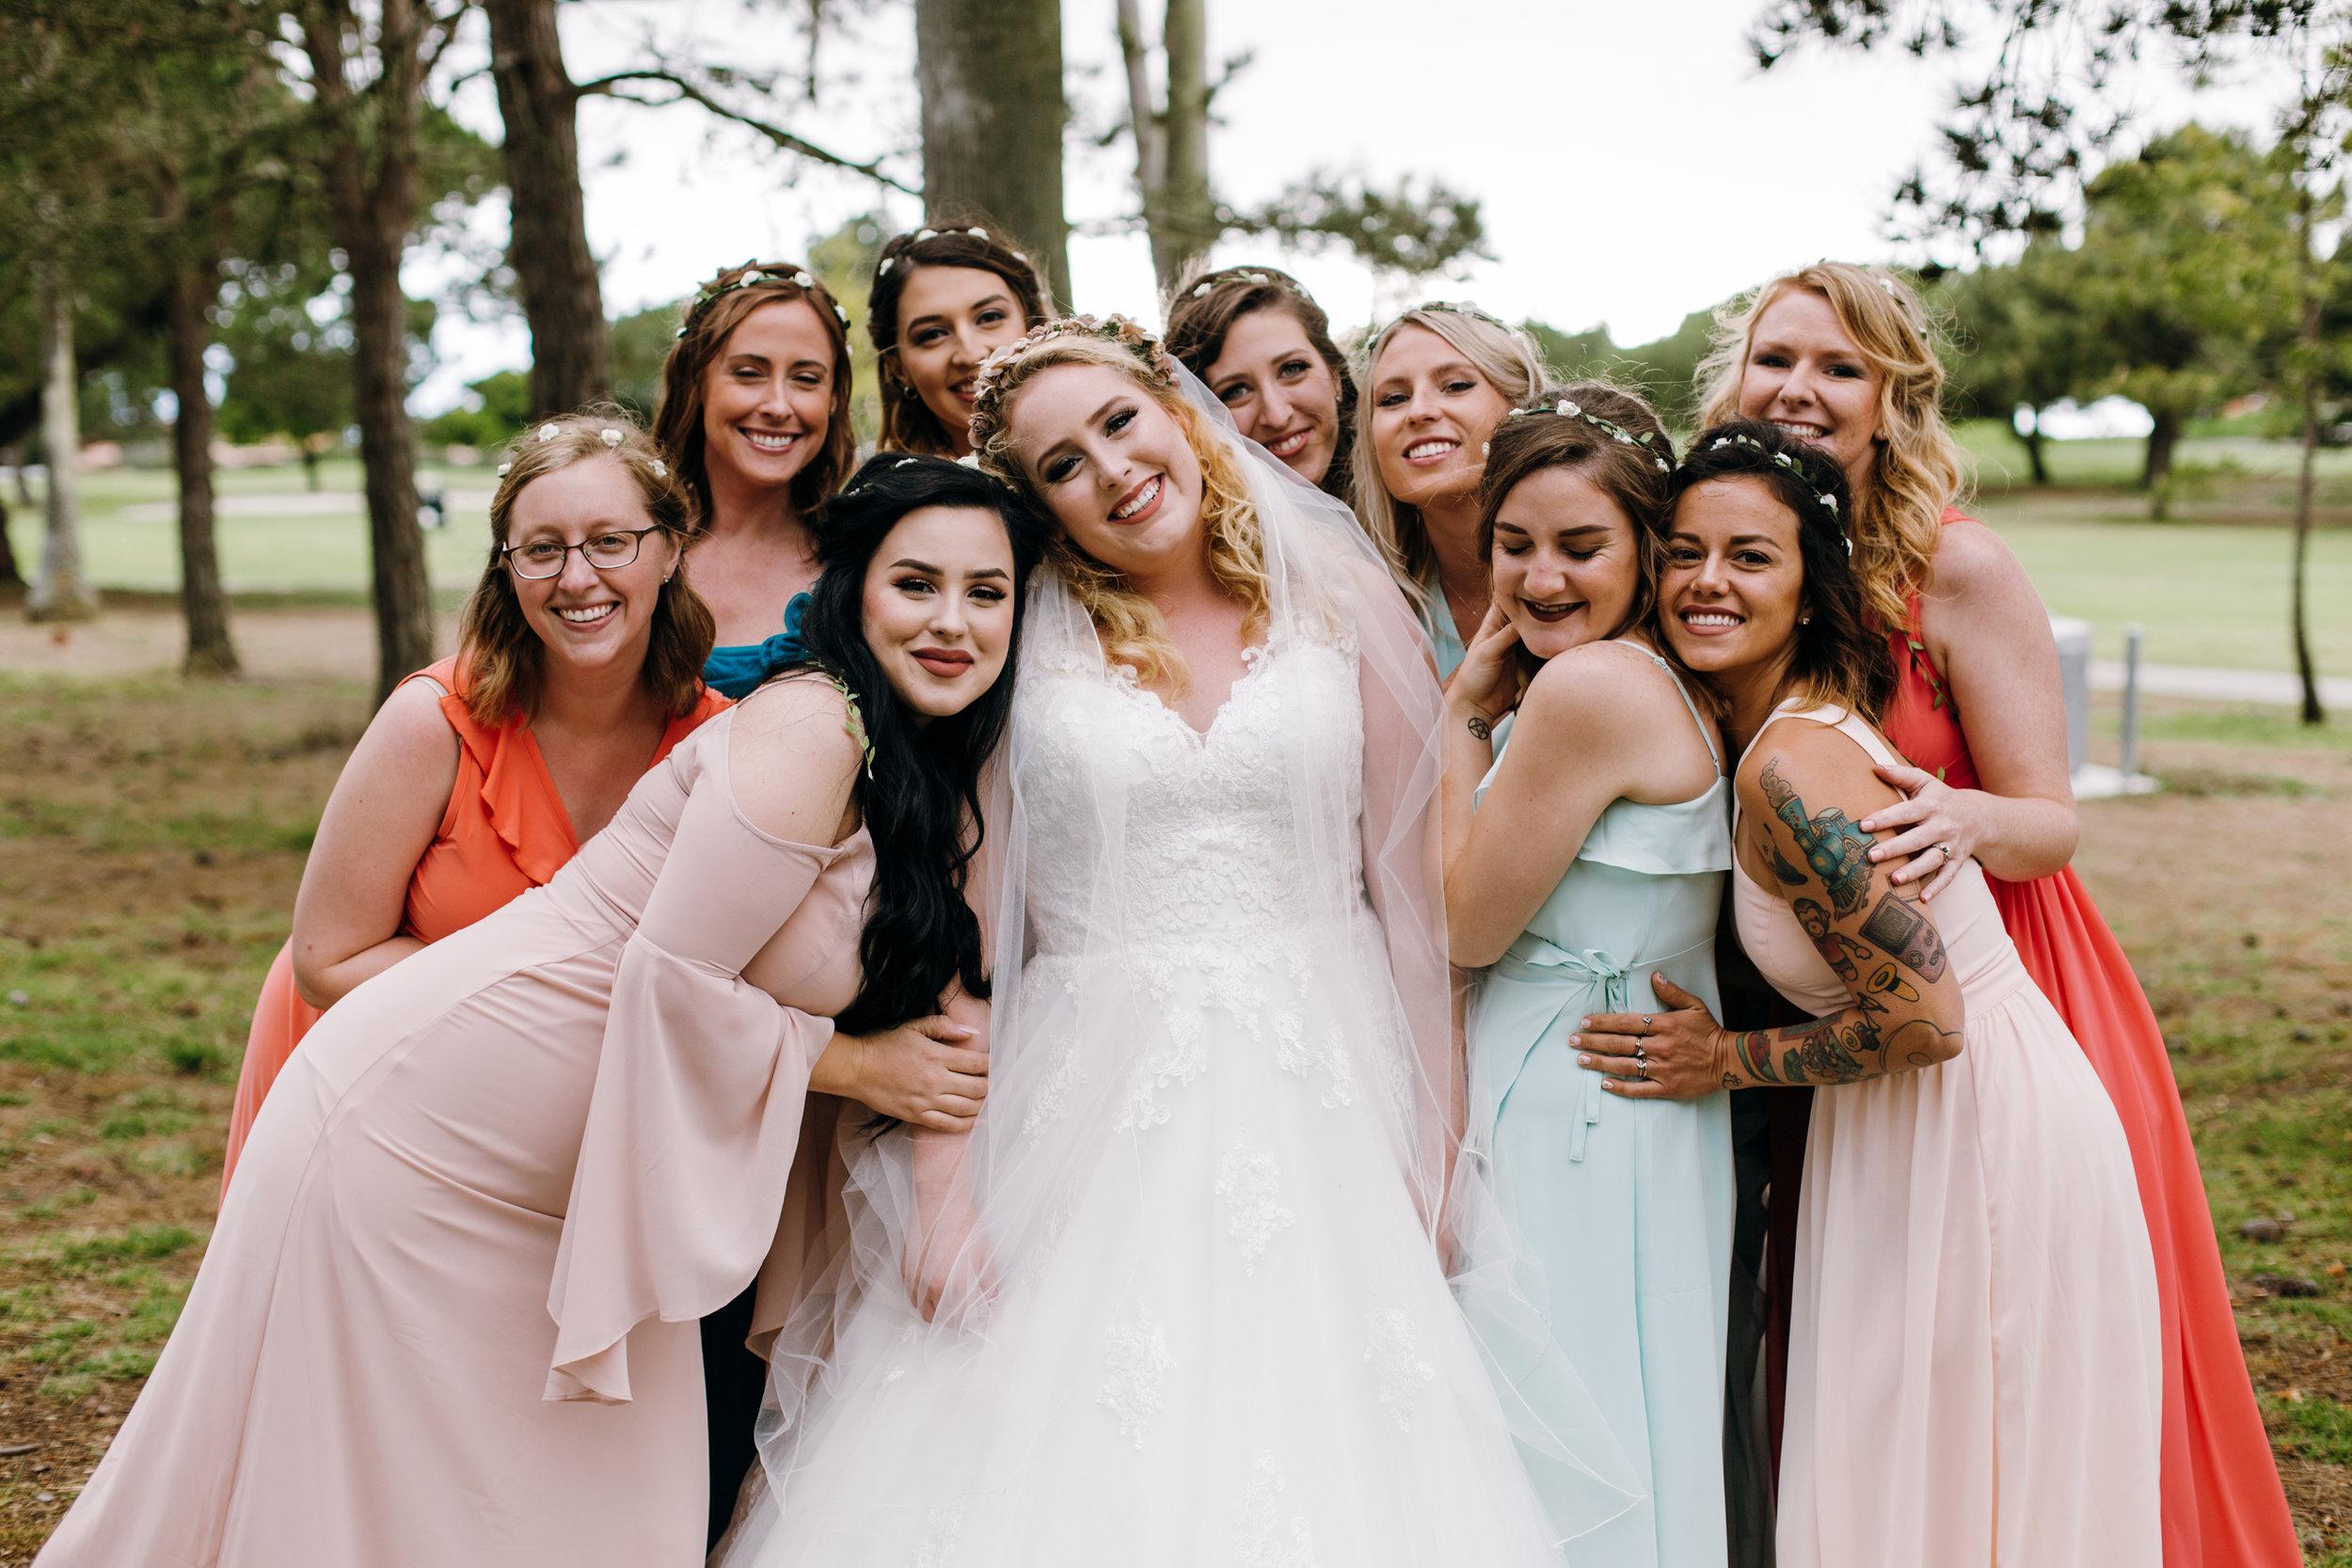 KaraNixonWeddings-PalosVerdes-Wedding-15.jpg